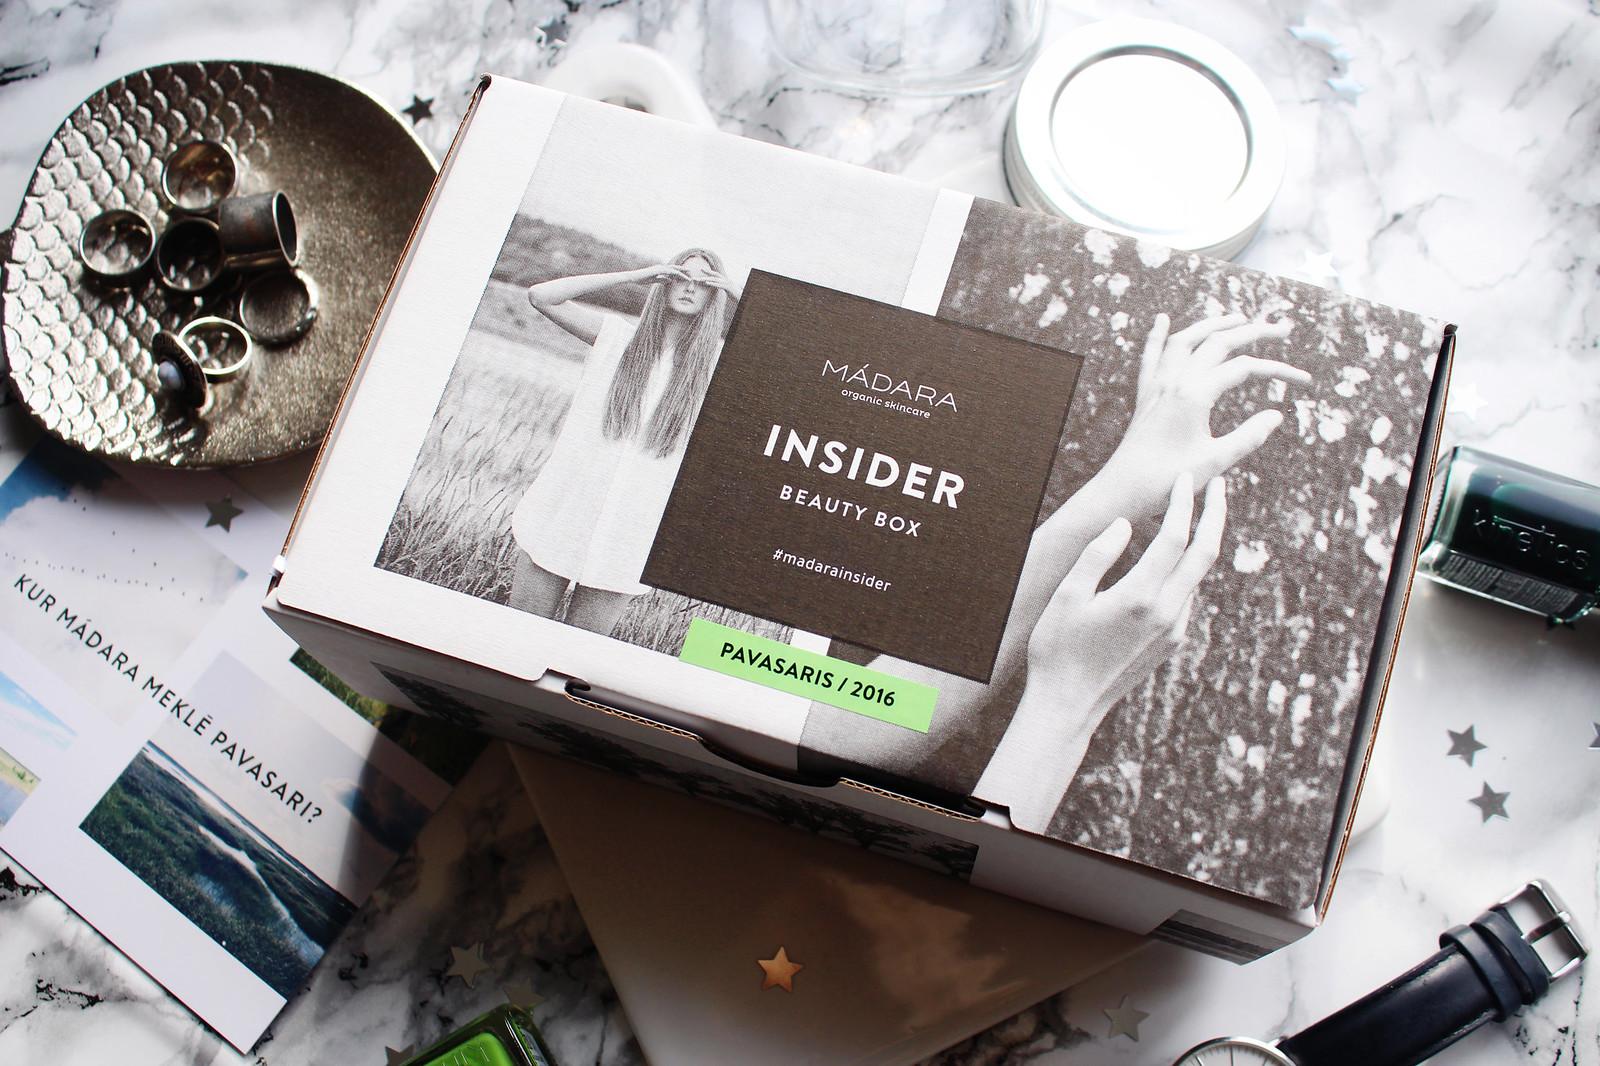 Madara Beauty Insider Box atsauksme